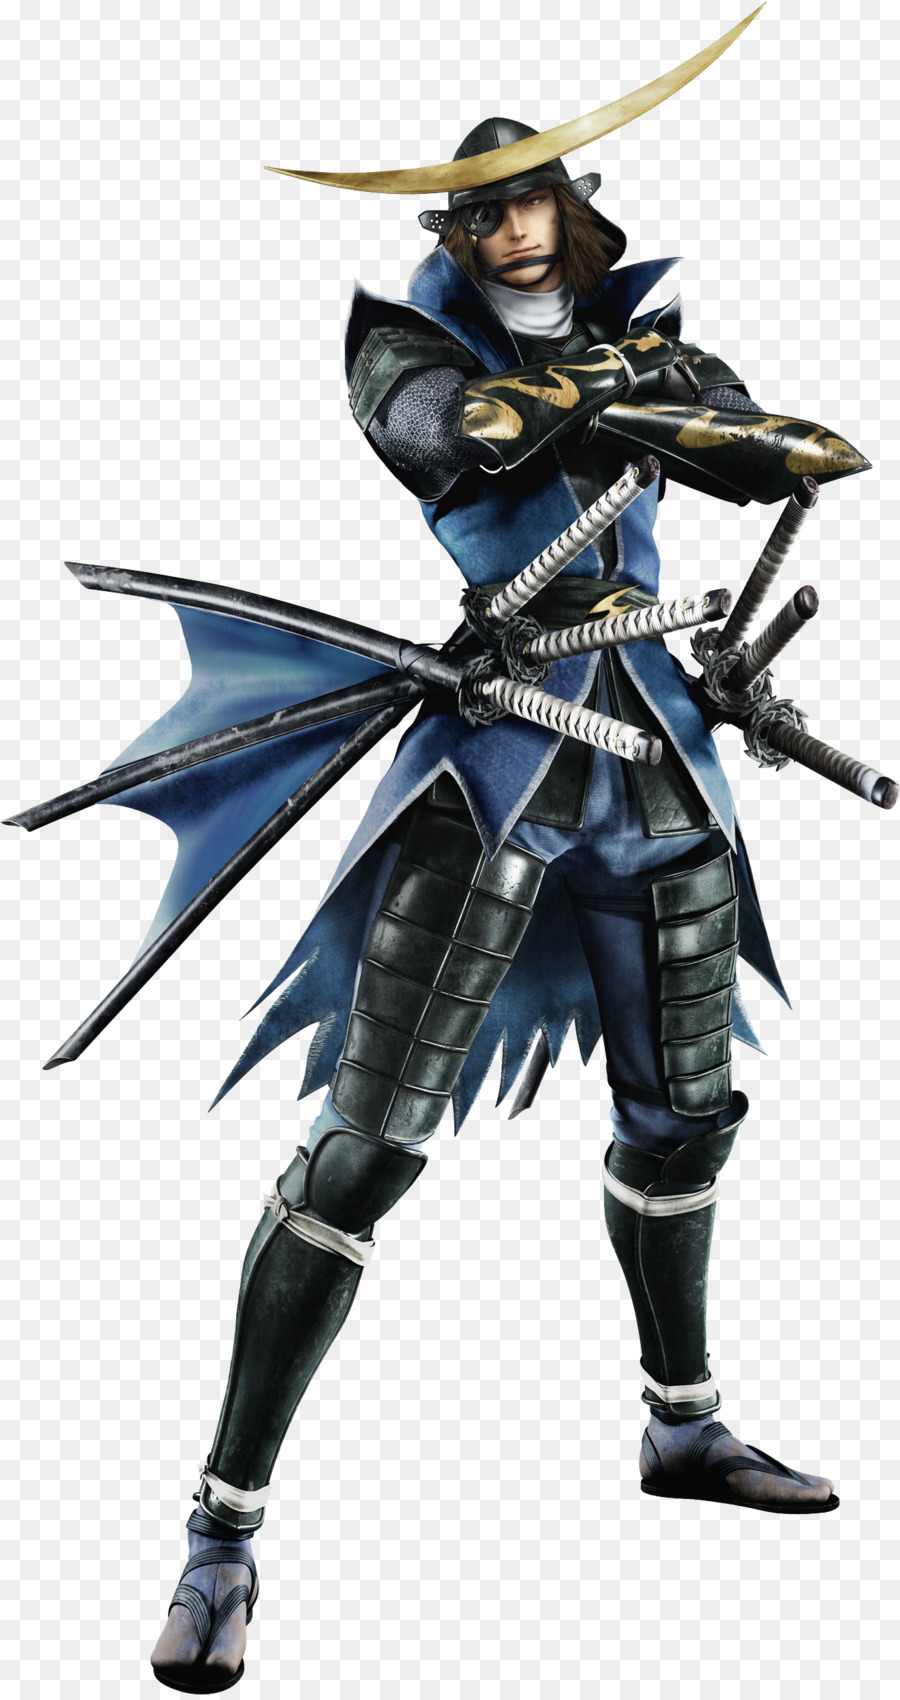 Sengoku basara 2 heroes hint for android apk download.